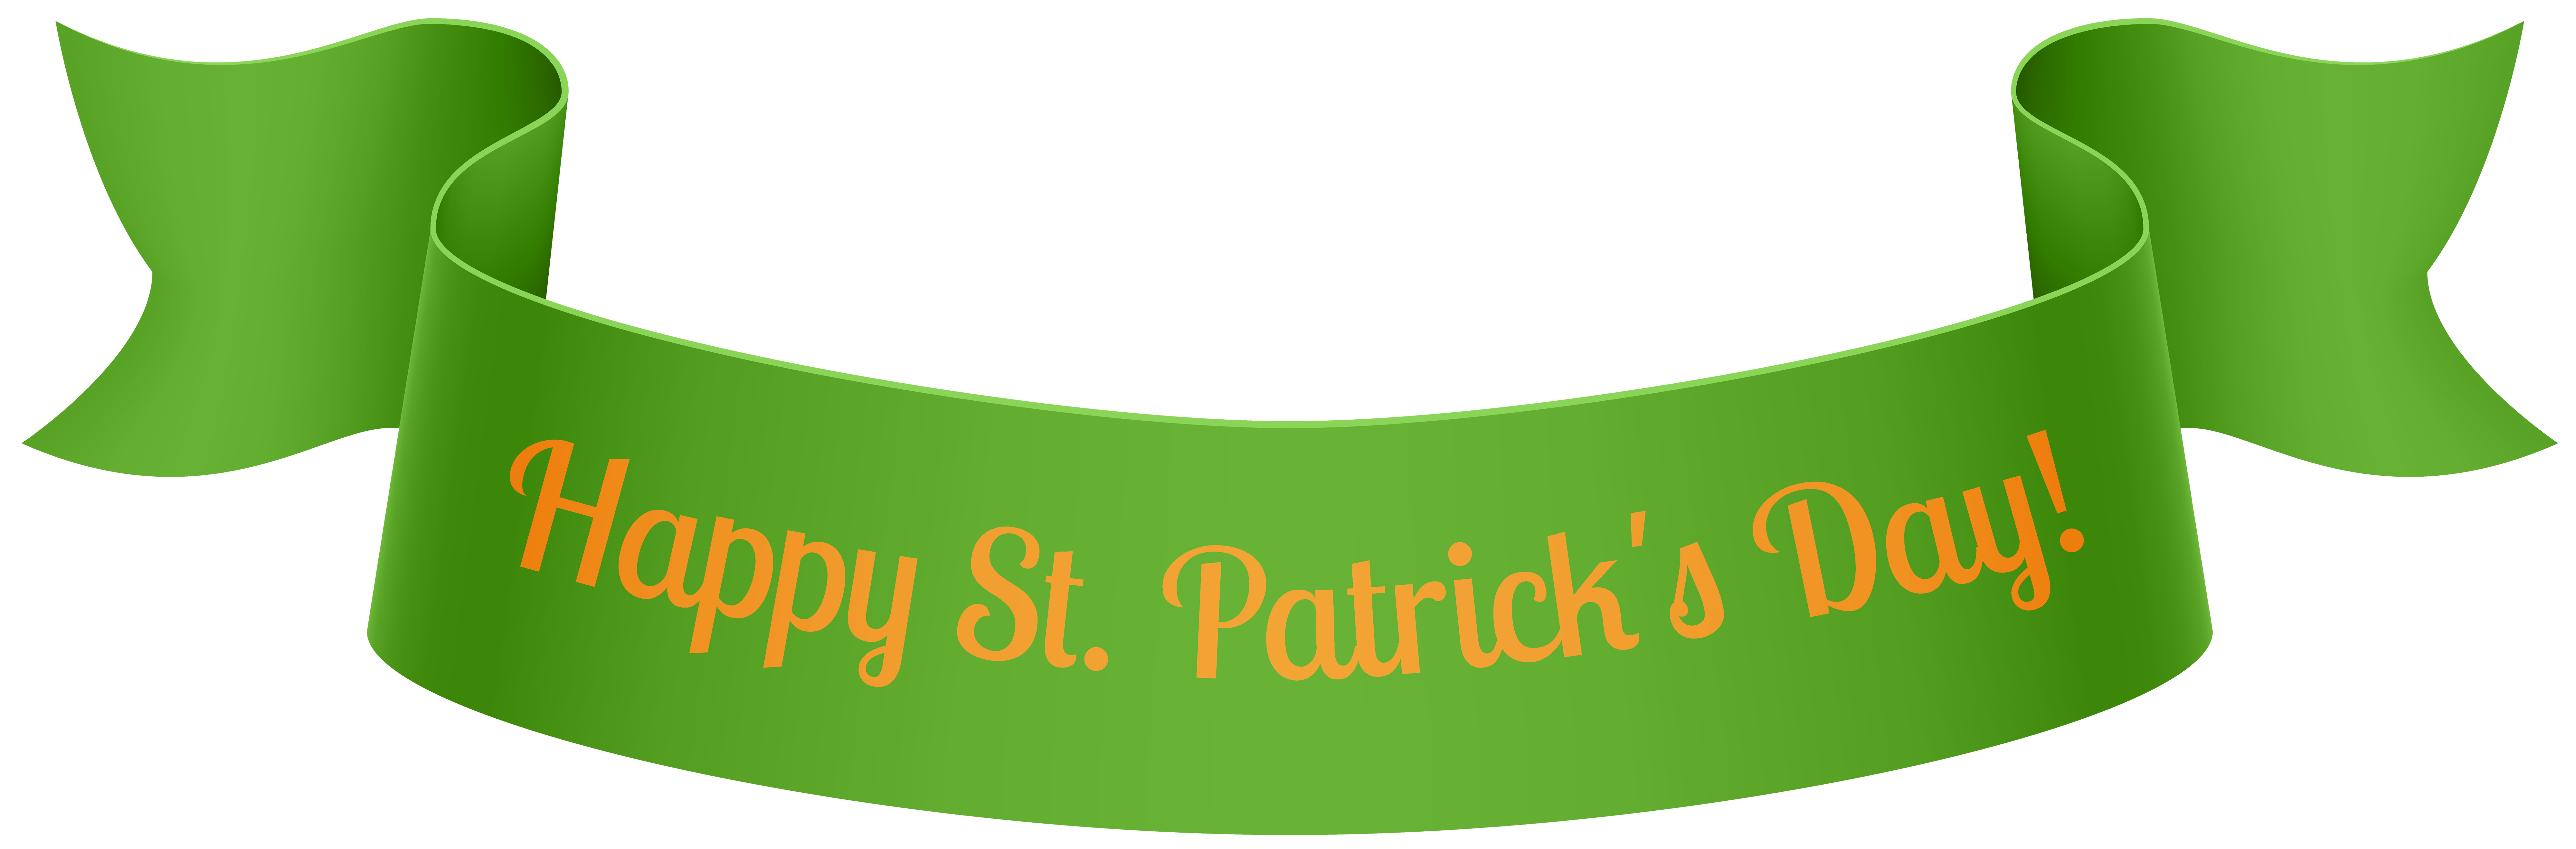 Clipart children st patricks day. Patrick s banner png